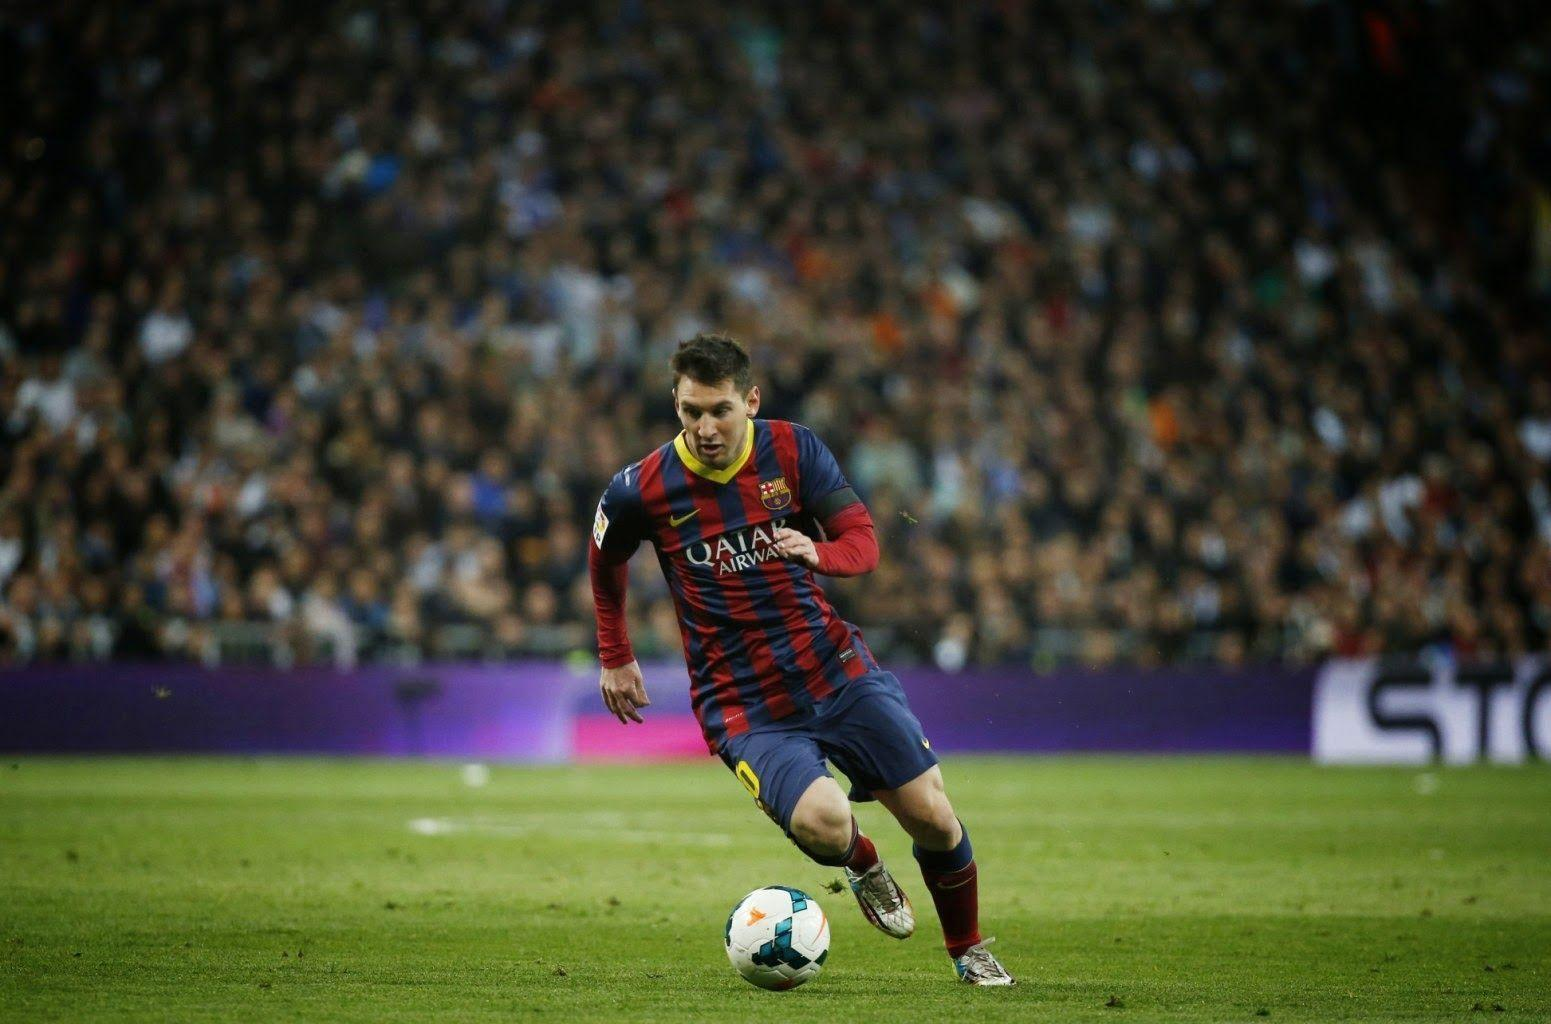 Lionel Messi Wallpaper...